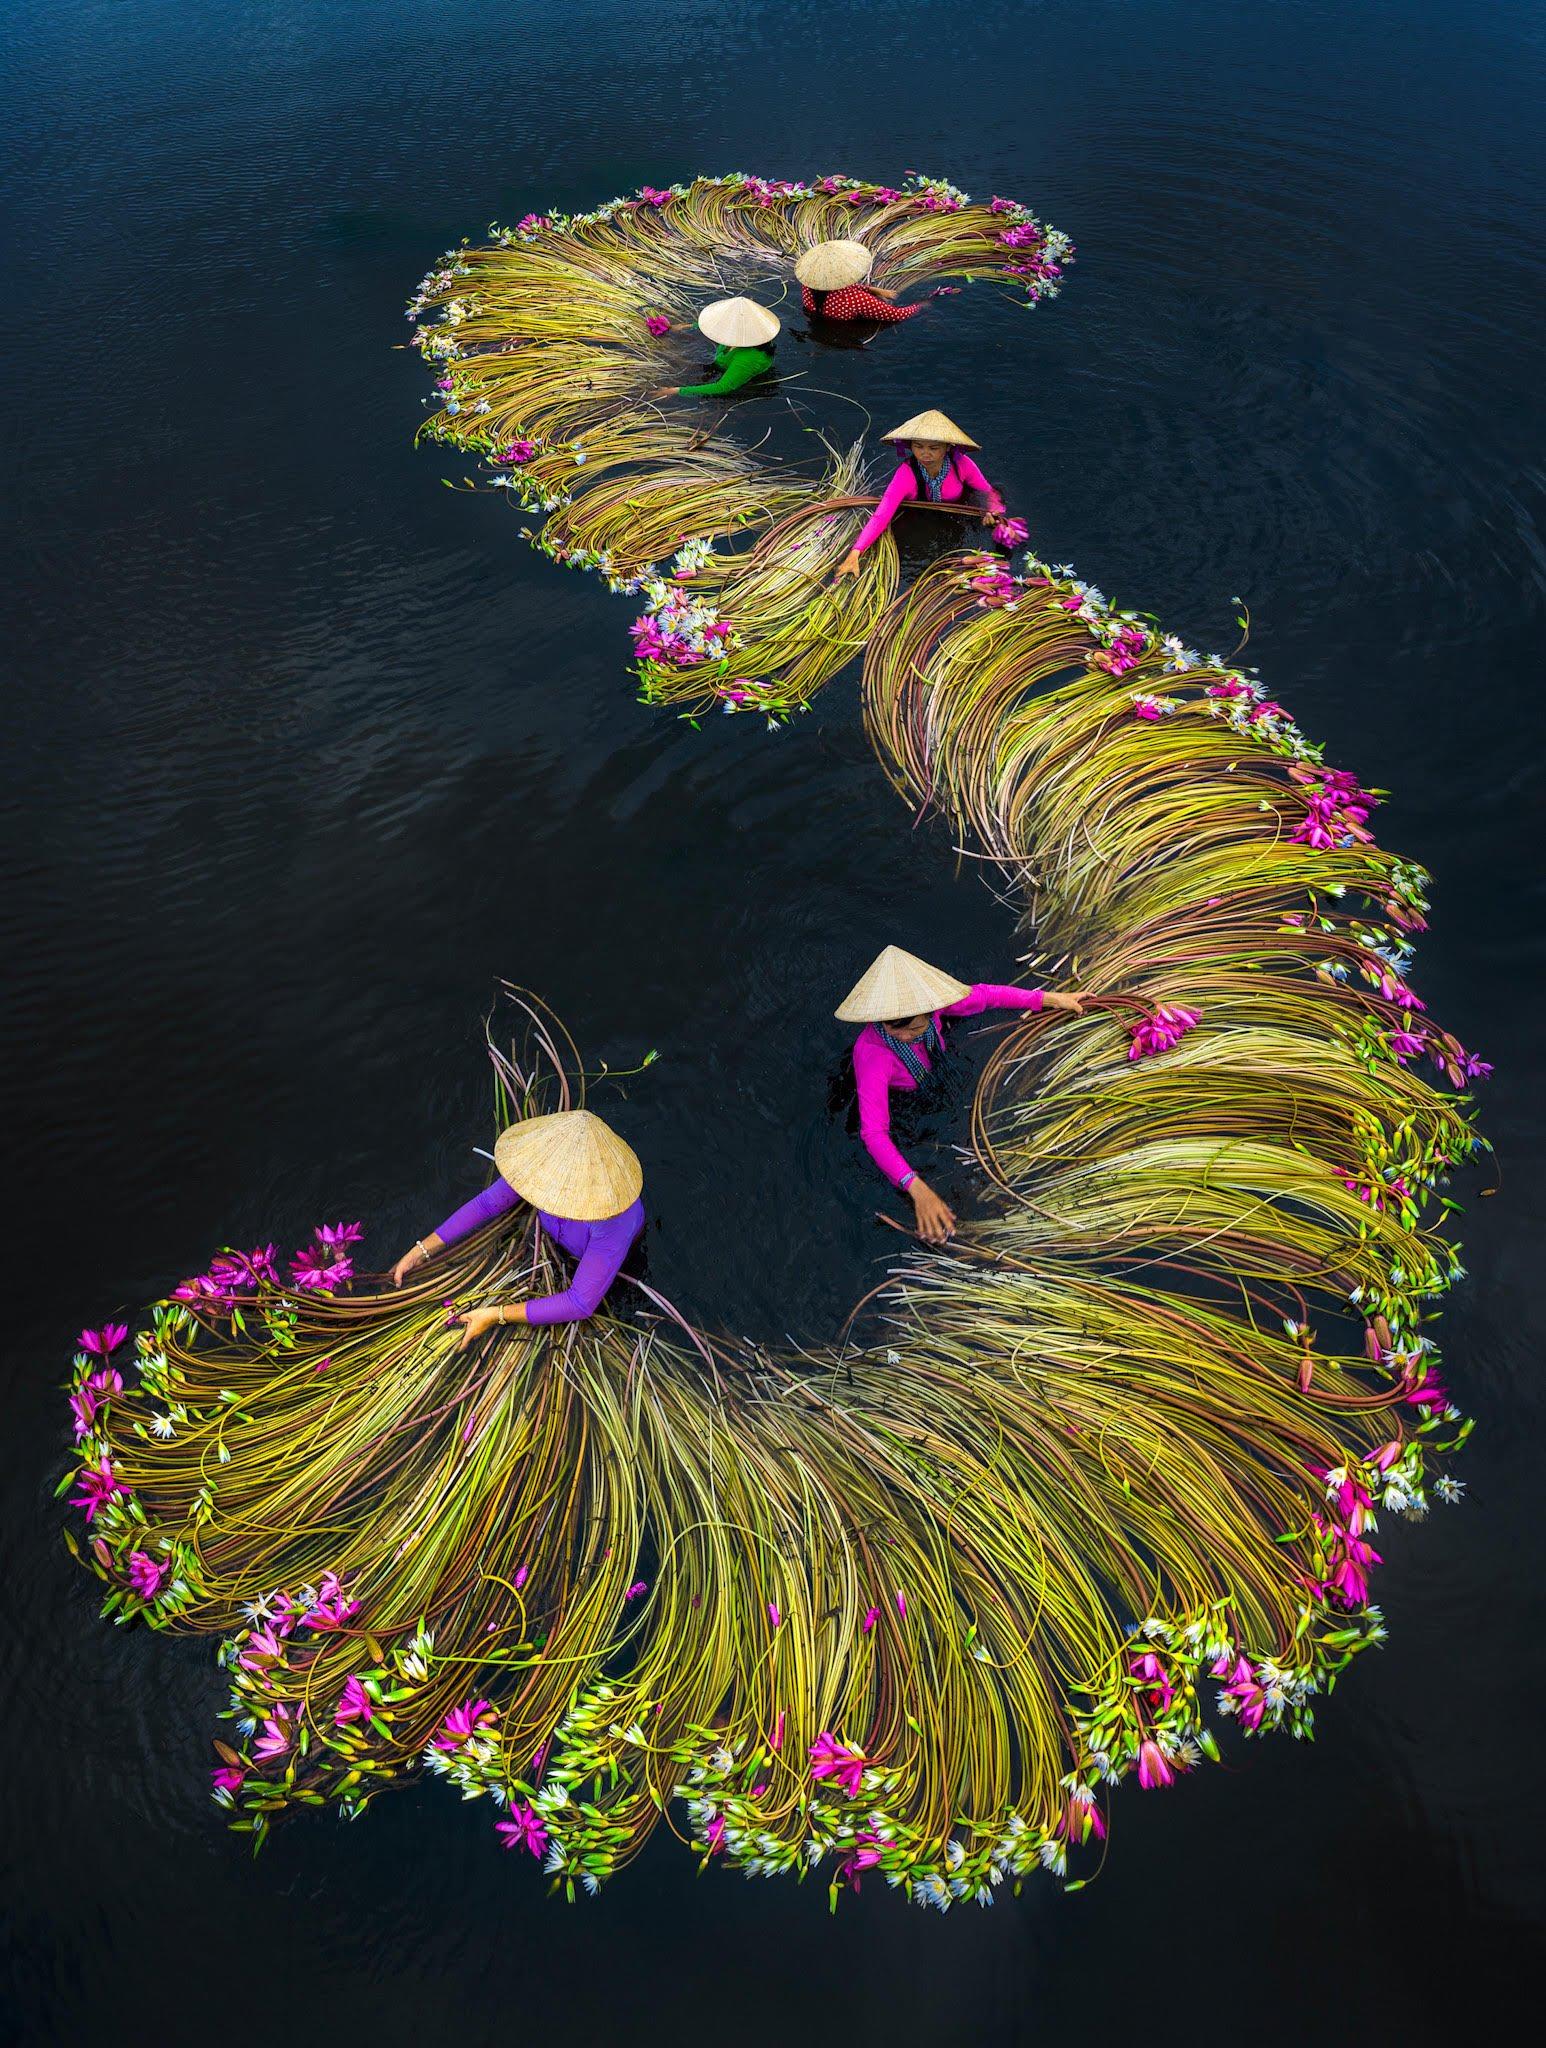 imagen cosecha anual de nenúfares en Vietnam EbwD26iXkAAmJaS?format=jpg&name=large